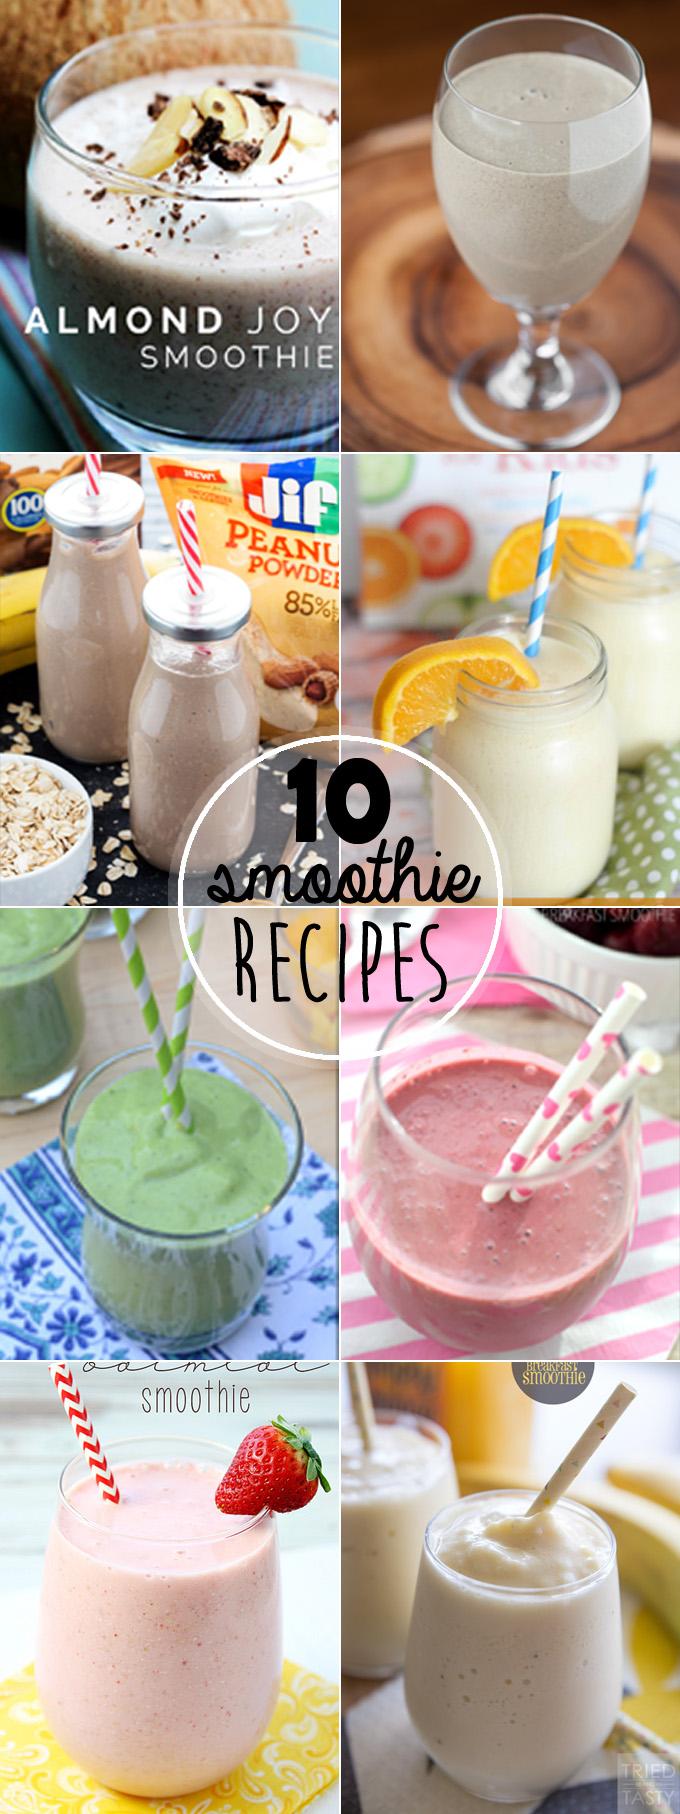 10-smoothie-recipes-pinterest